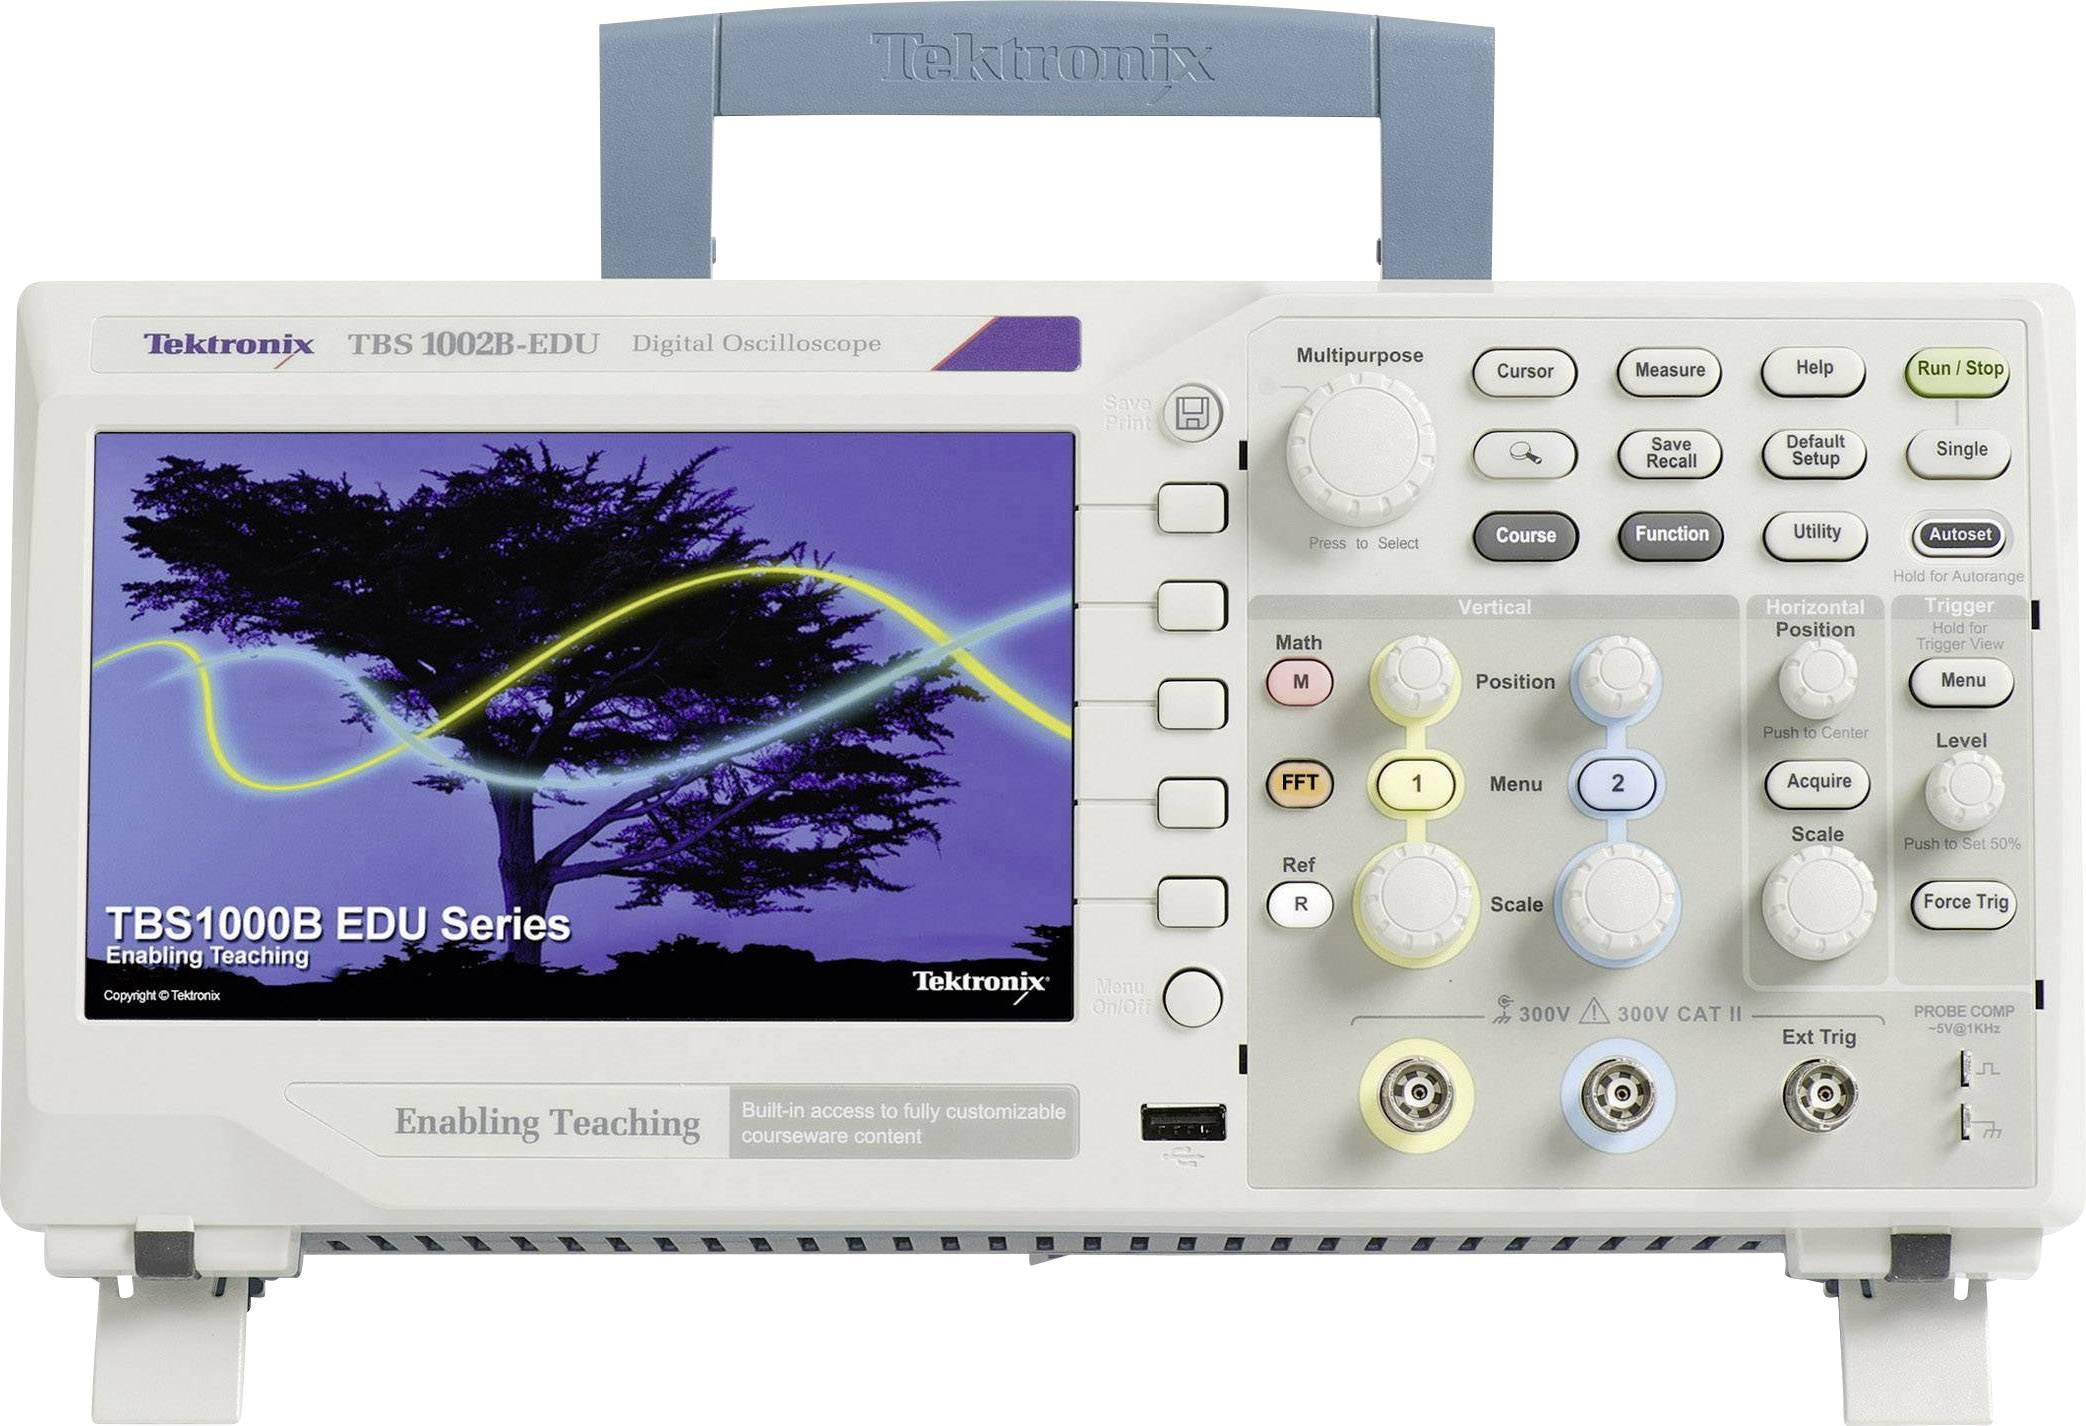 Digitální osciloskop Tektronix TBS1102B-EDU, 100 MHz, 2kanálový, kalibrováno dle ISO